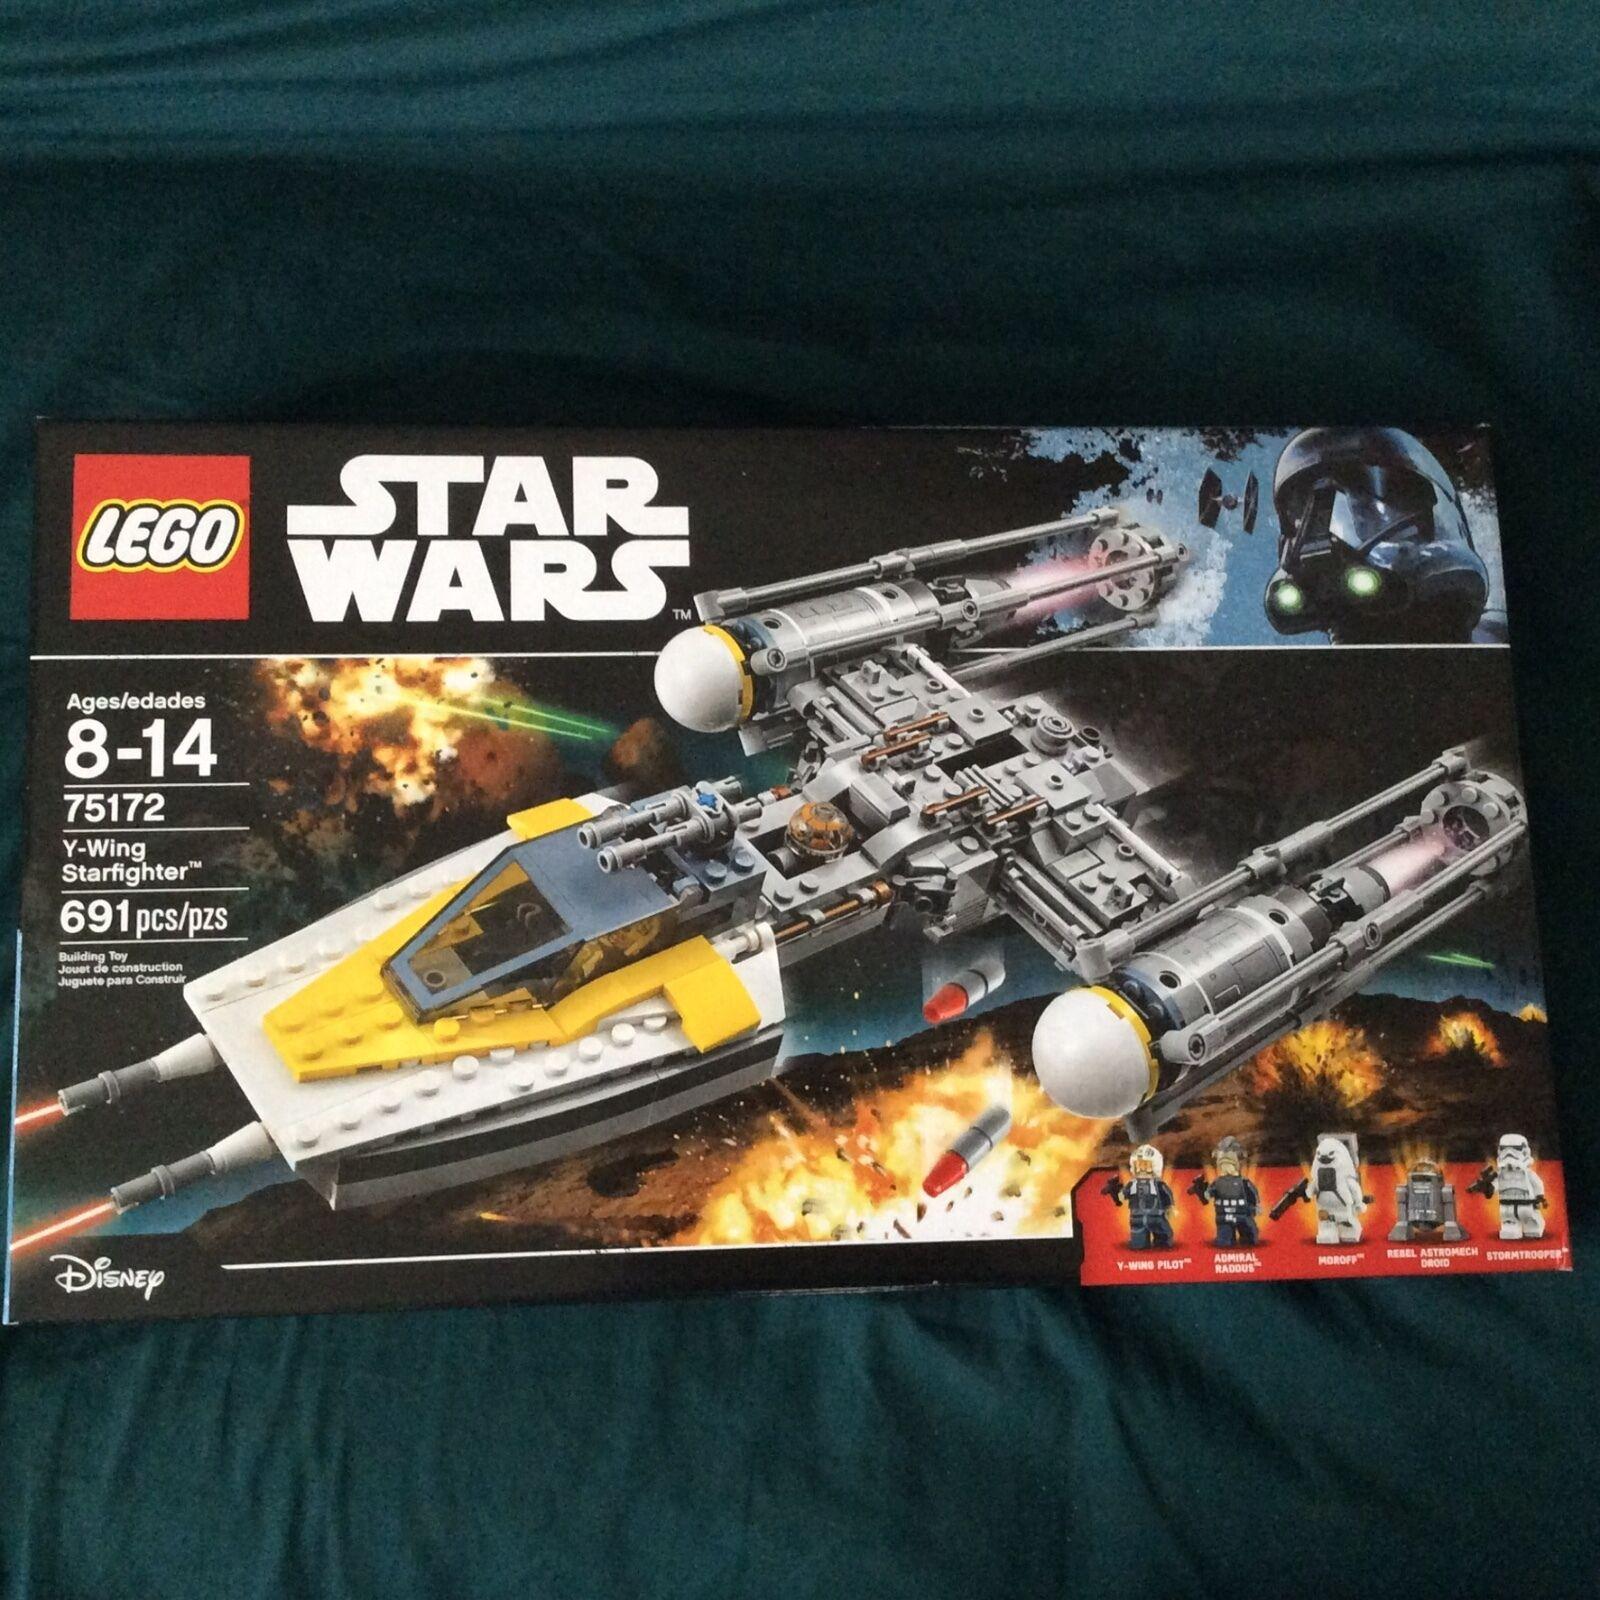 2017 LEGO estrella guerras   75172 Y-WING estrellaFIGHTER (5) MINI cifraS NISB    solo per te